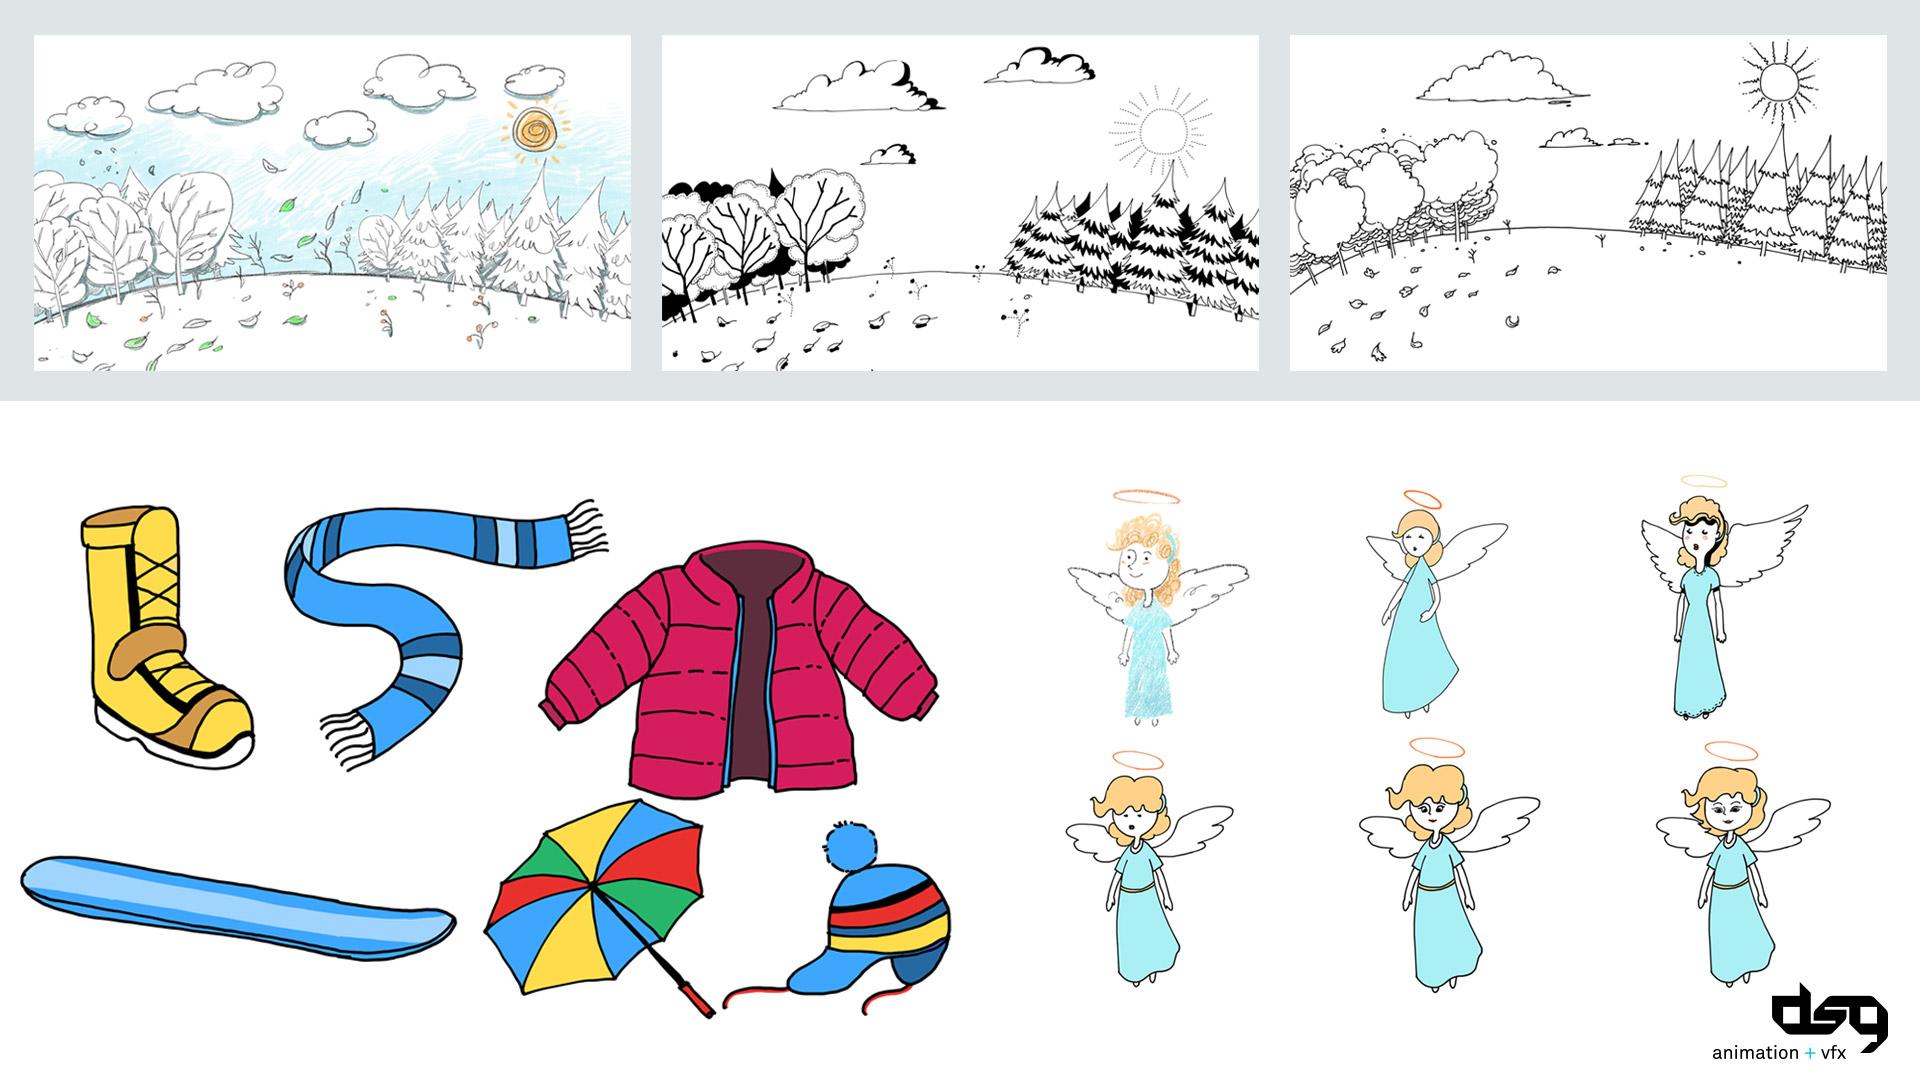 PuffyPuf_Vlad_Pascanu_illustration_2_v01.jpg